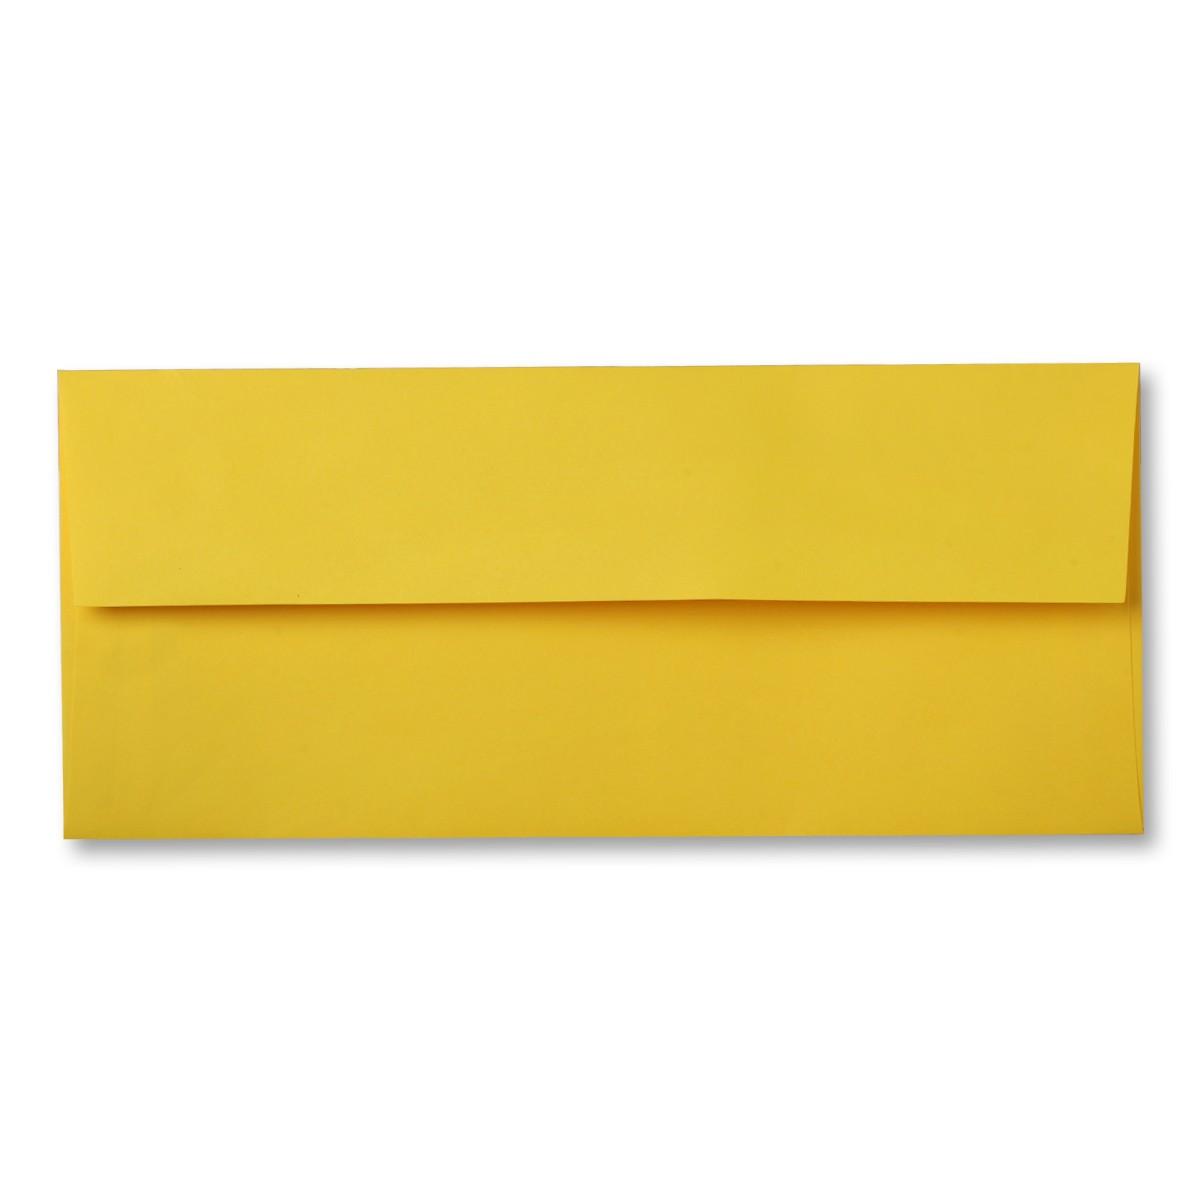 4 1 8 x 9 1 2 envelope